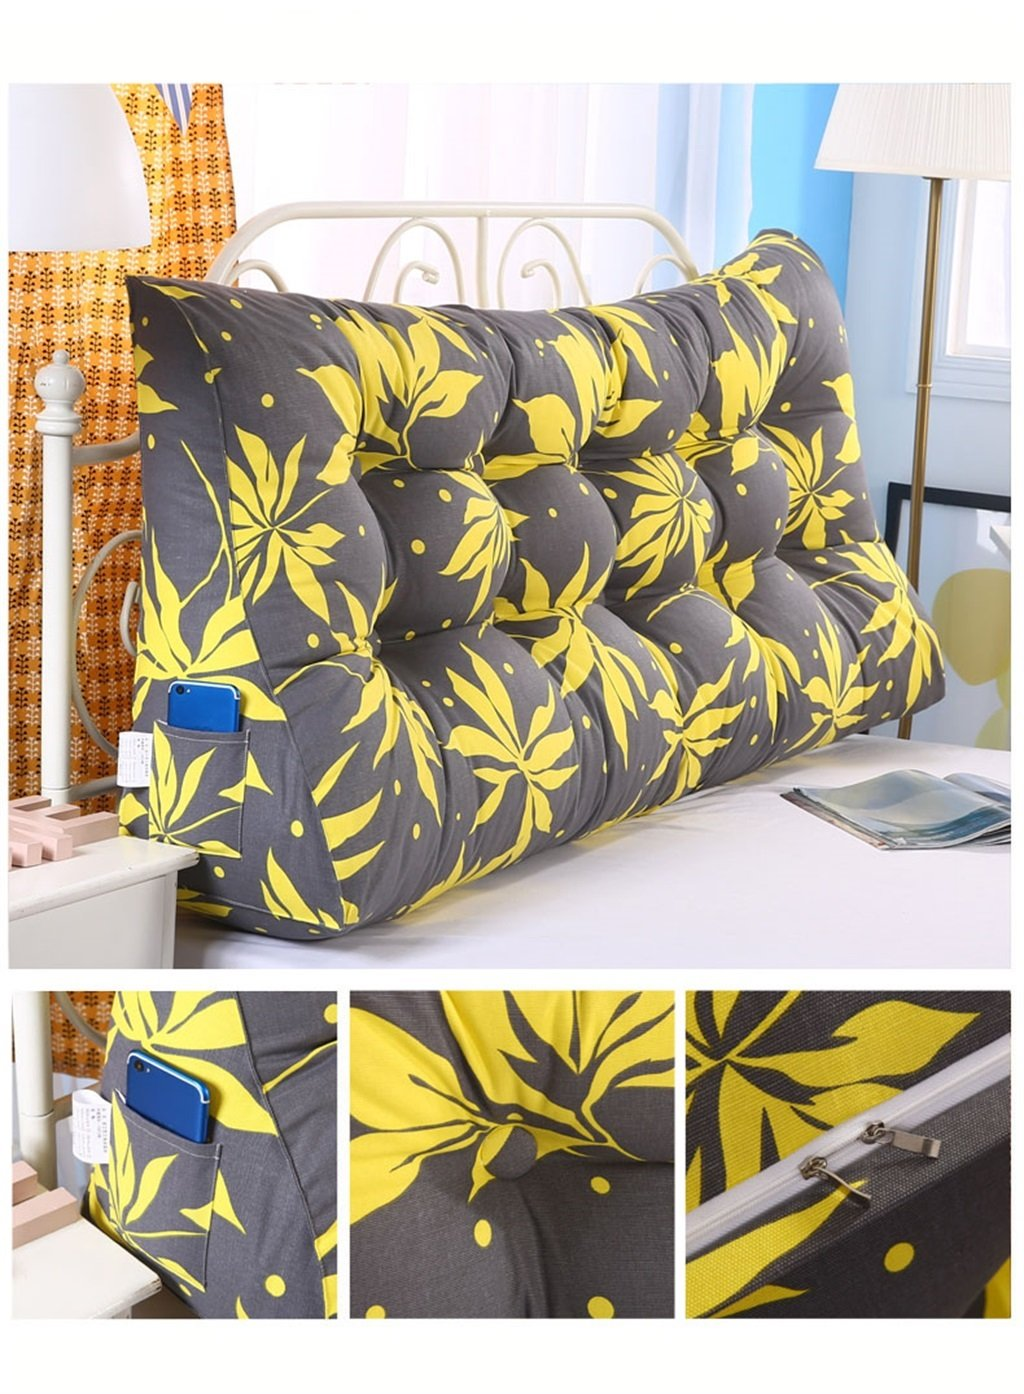 Almohada Almohada Almohada Triangular Cojín Cabecero Double Soft Tatami Pillow Lumbar Pillow Bed Large Cojín Sofá Respaldo Almohada (Color   2, Tamaño   90cm) 2a12ff